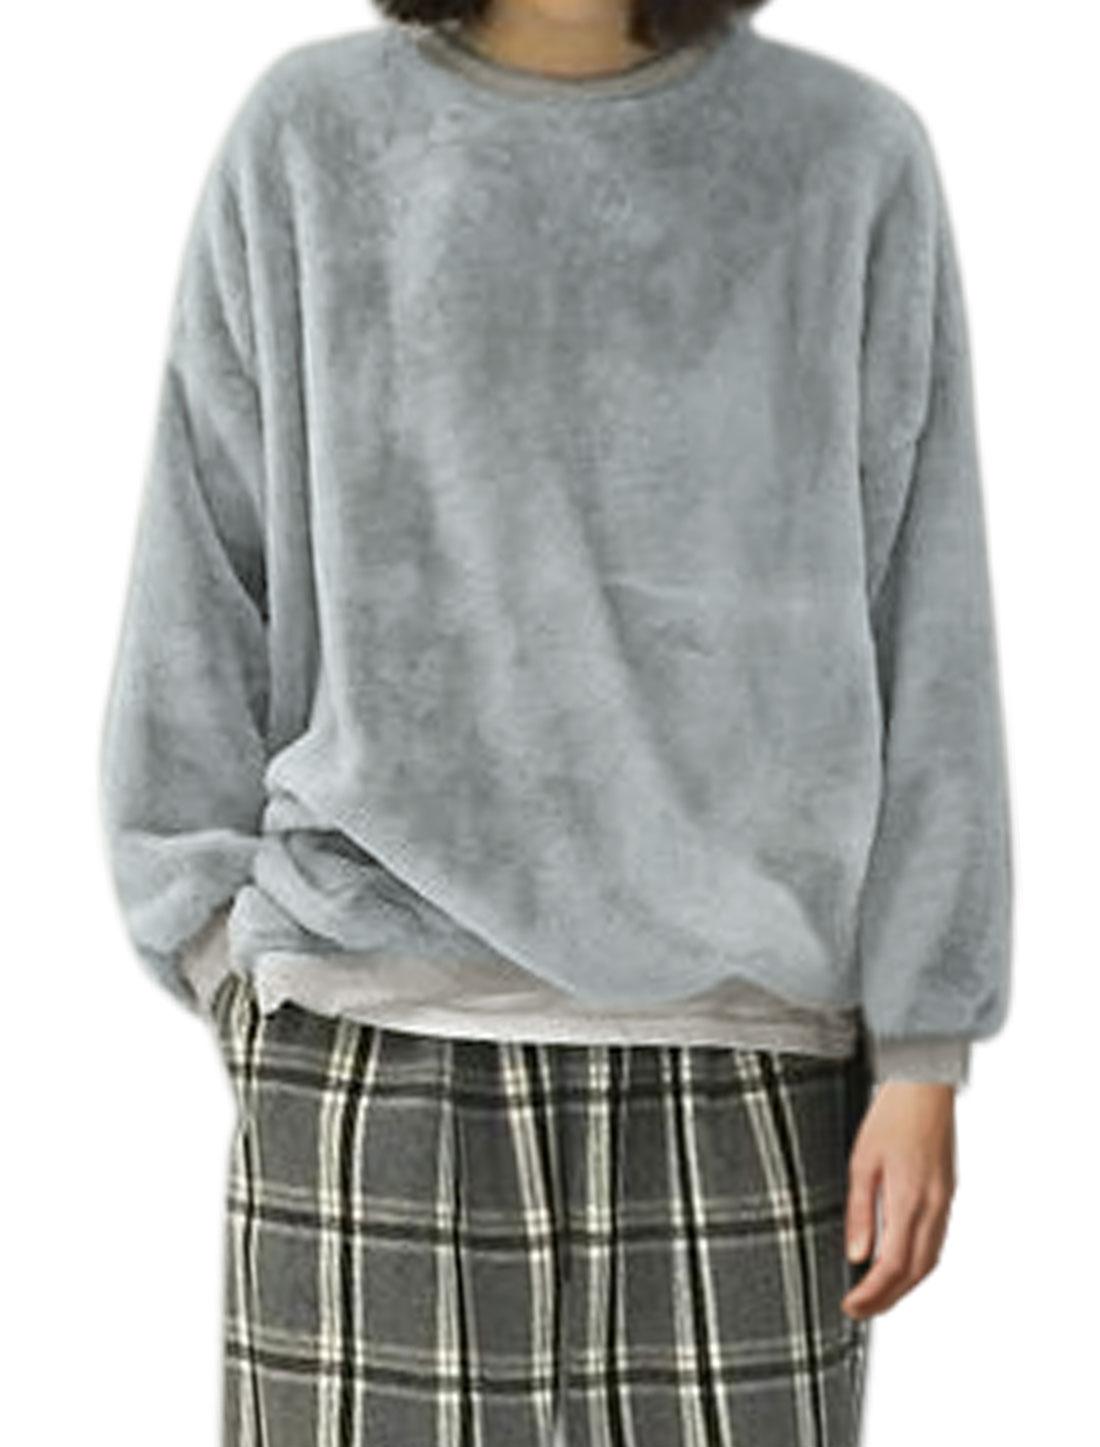 Ladies Zipper Side Loose Batwing Plush Sweatshirt Gray XS